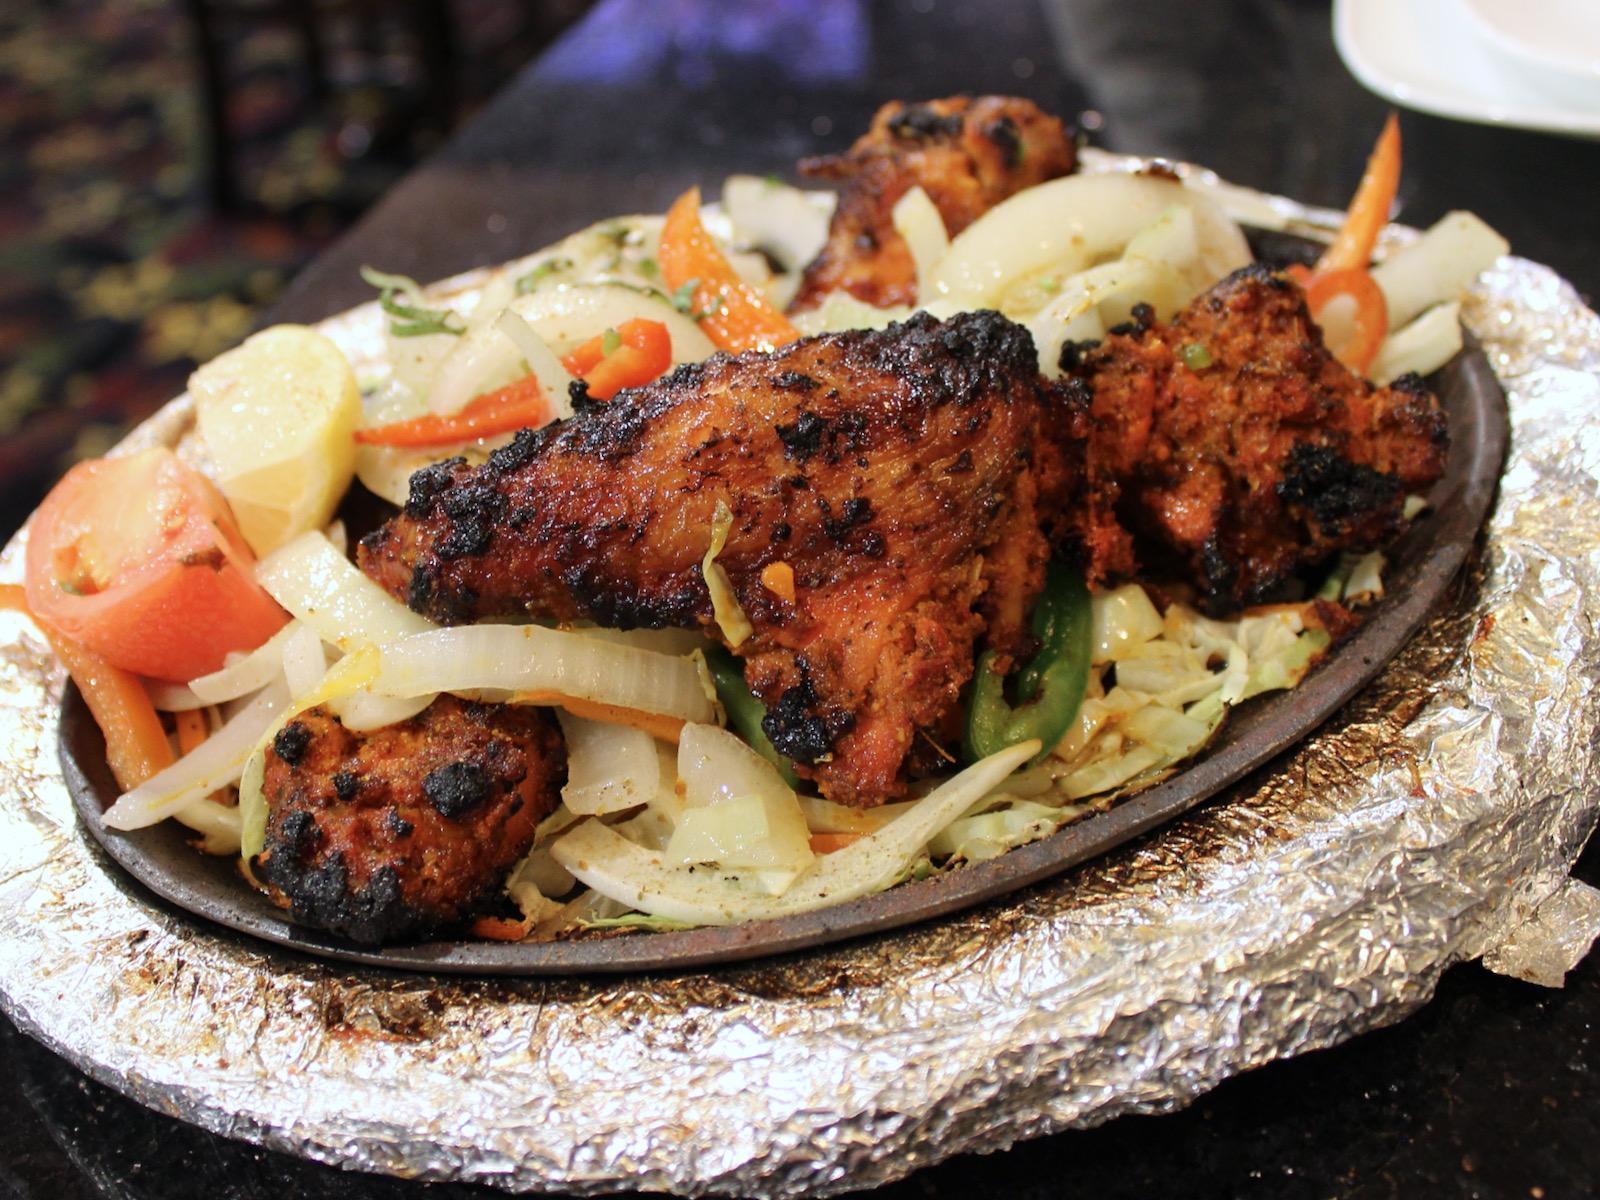 Tandoori chicken at Bollywood Grill